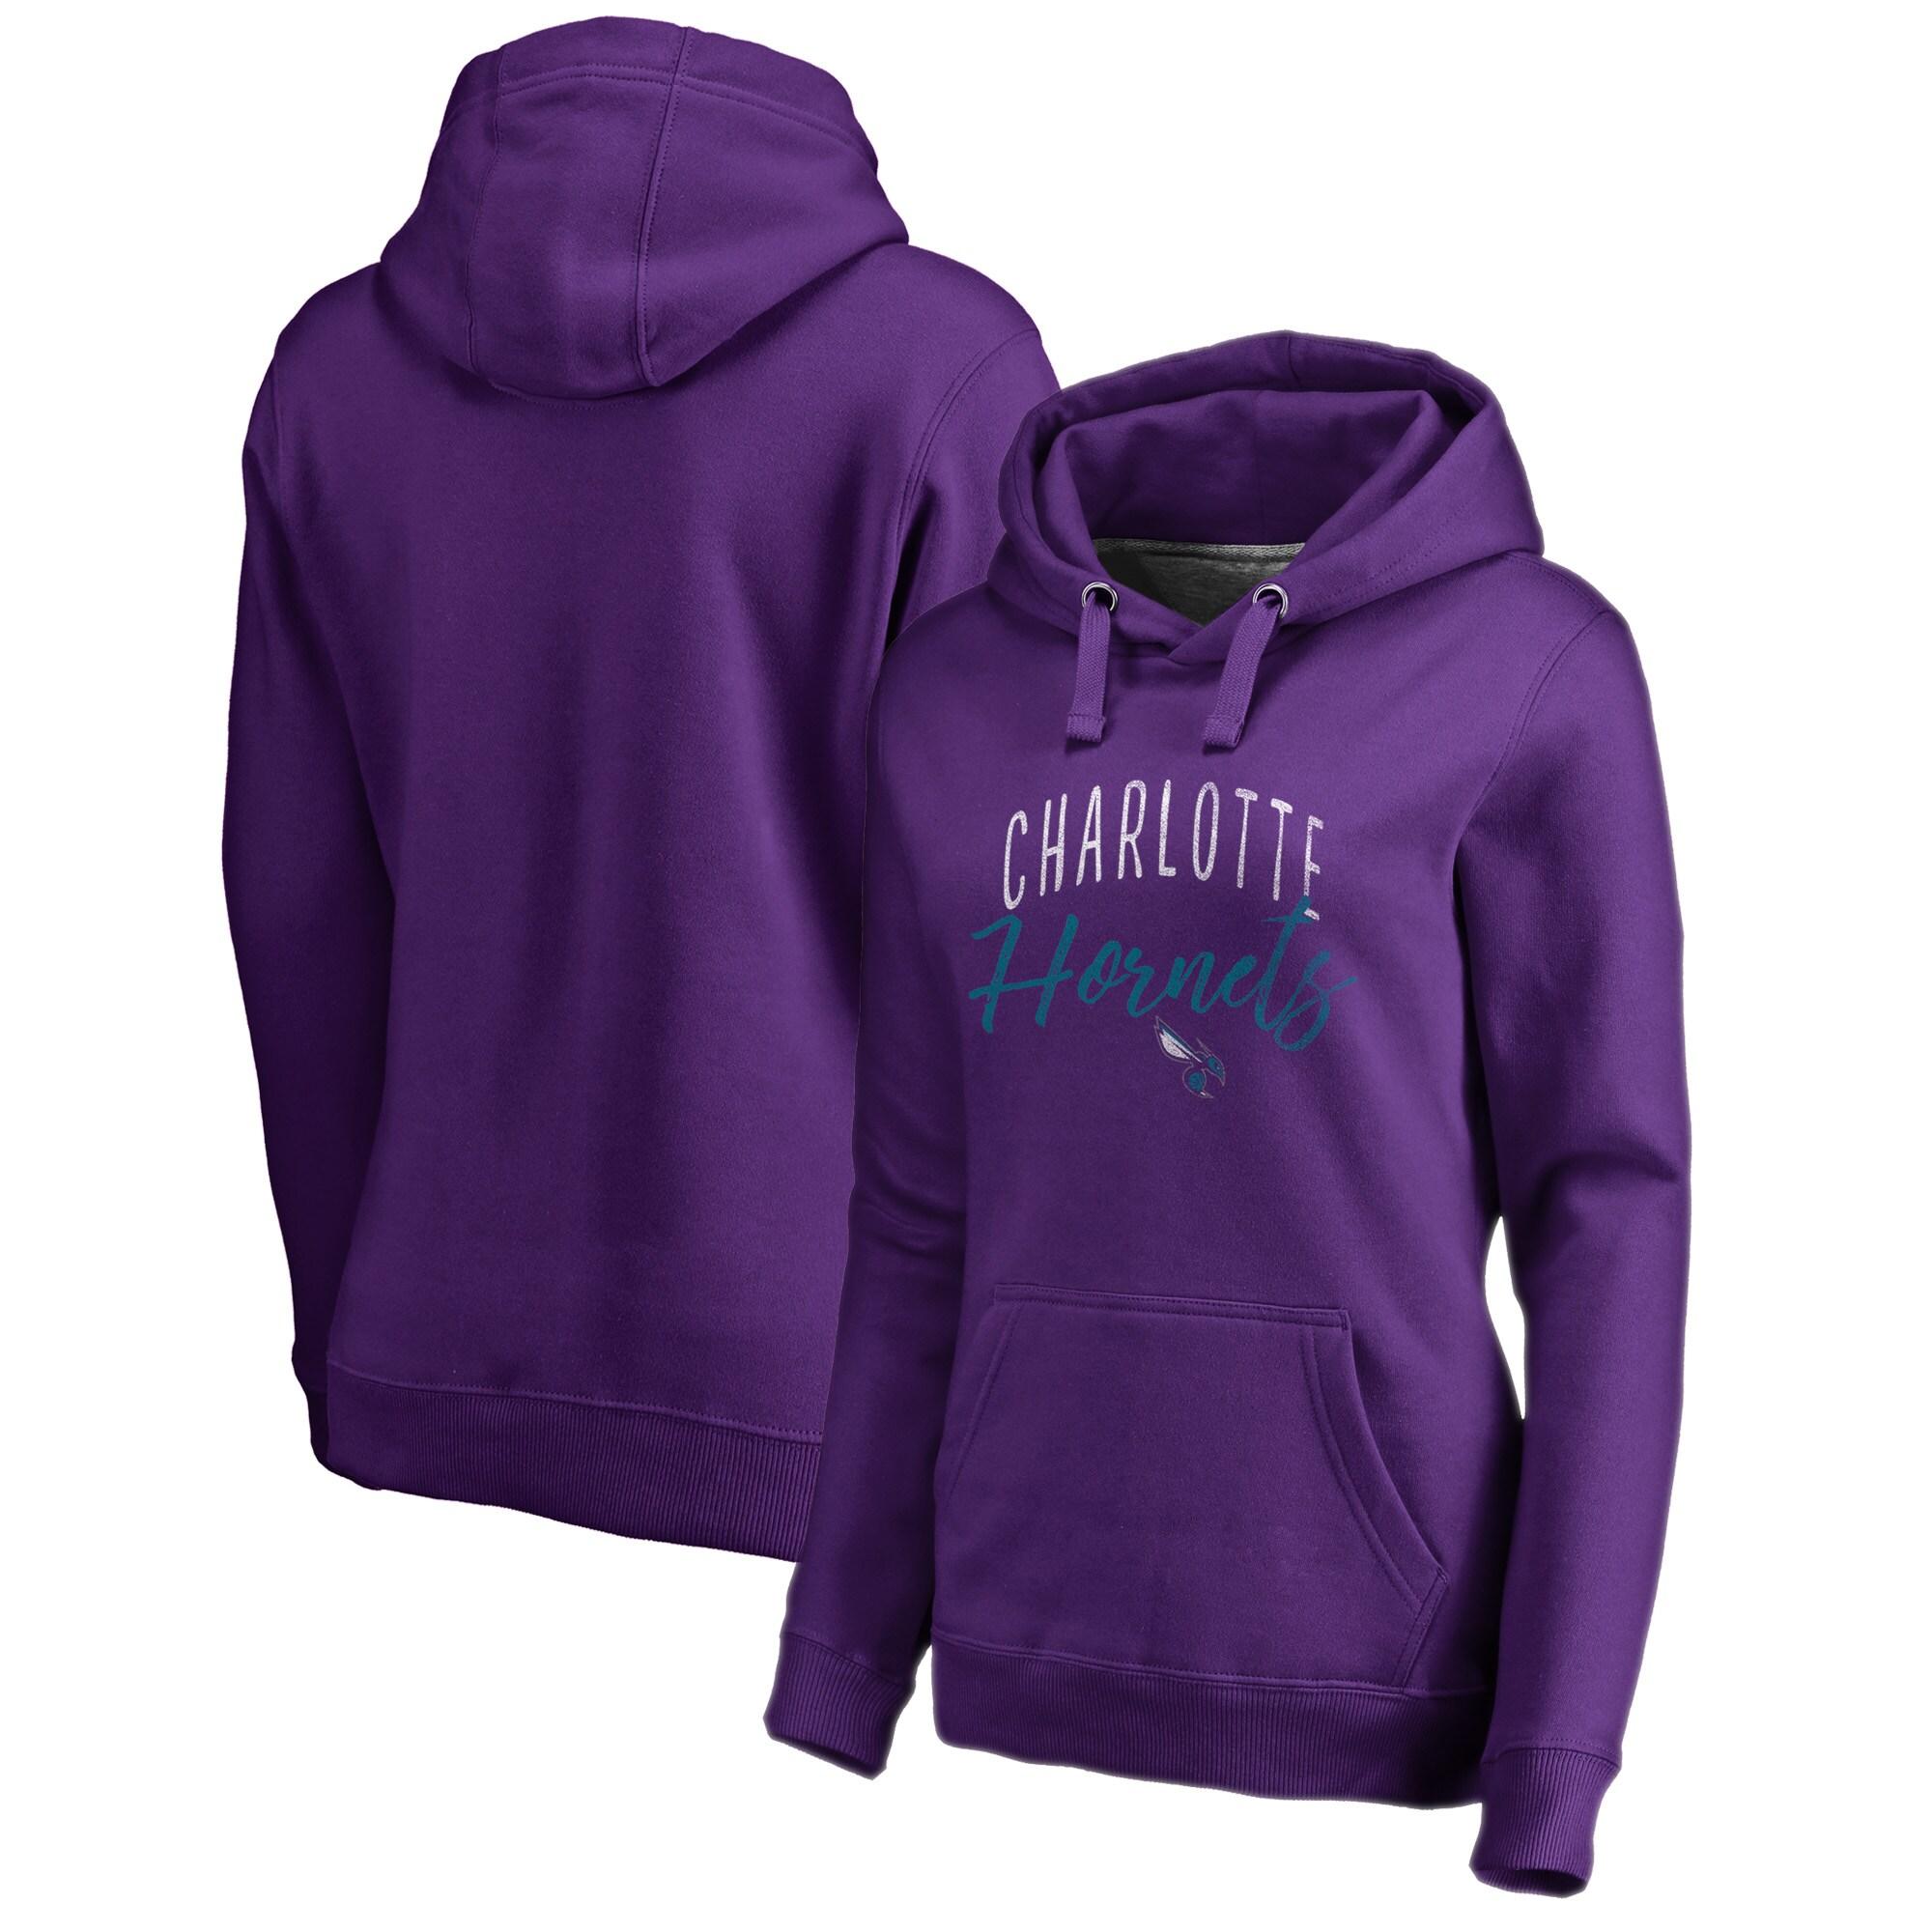 Charlotte Hornets Fanatics Branded Women's Graceful Plus Size Pullover Hoodie - Purple